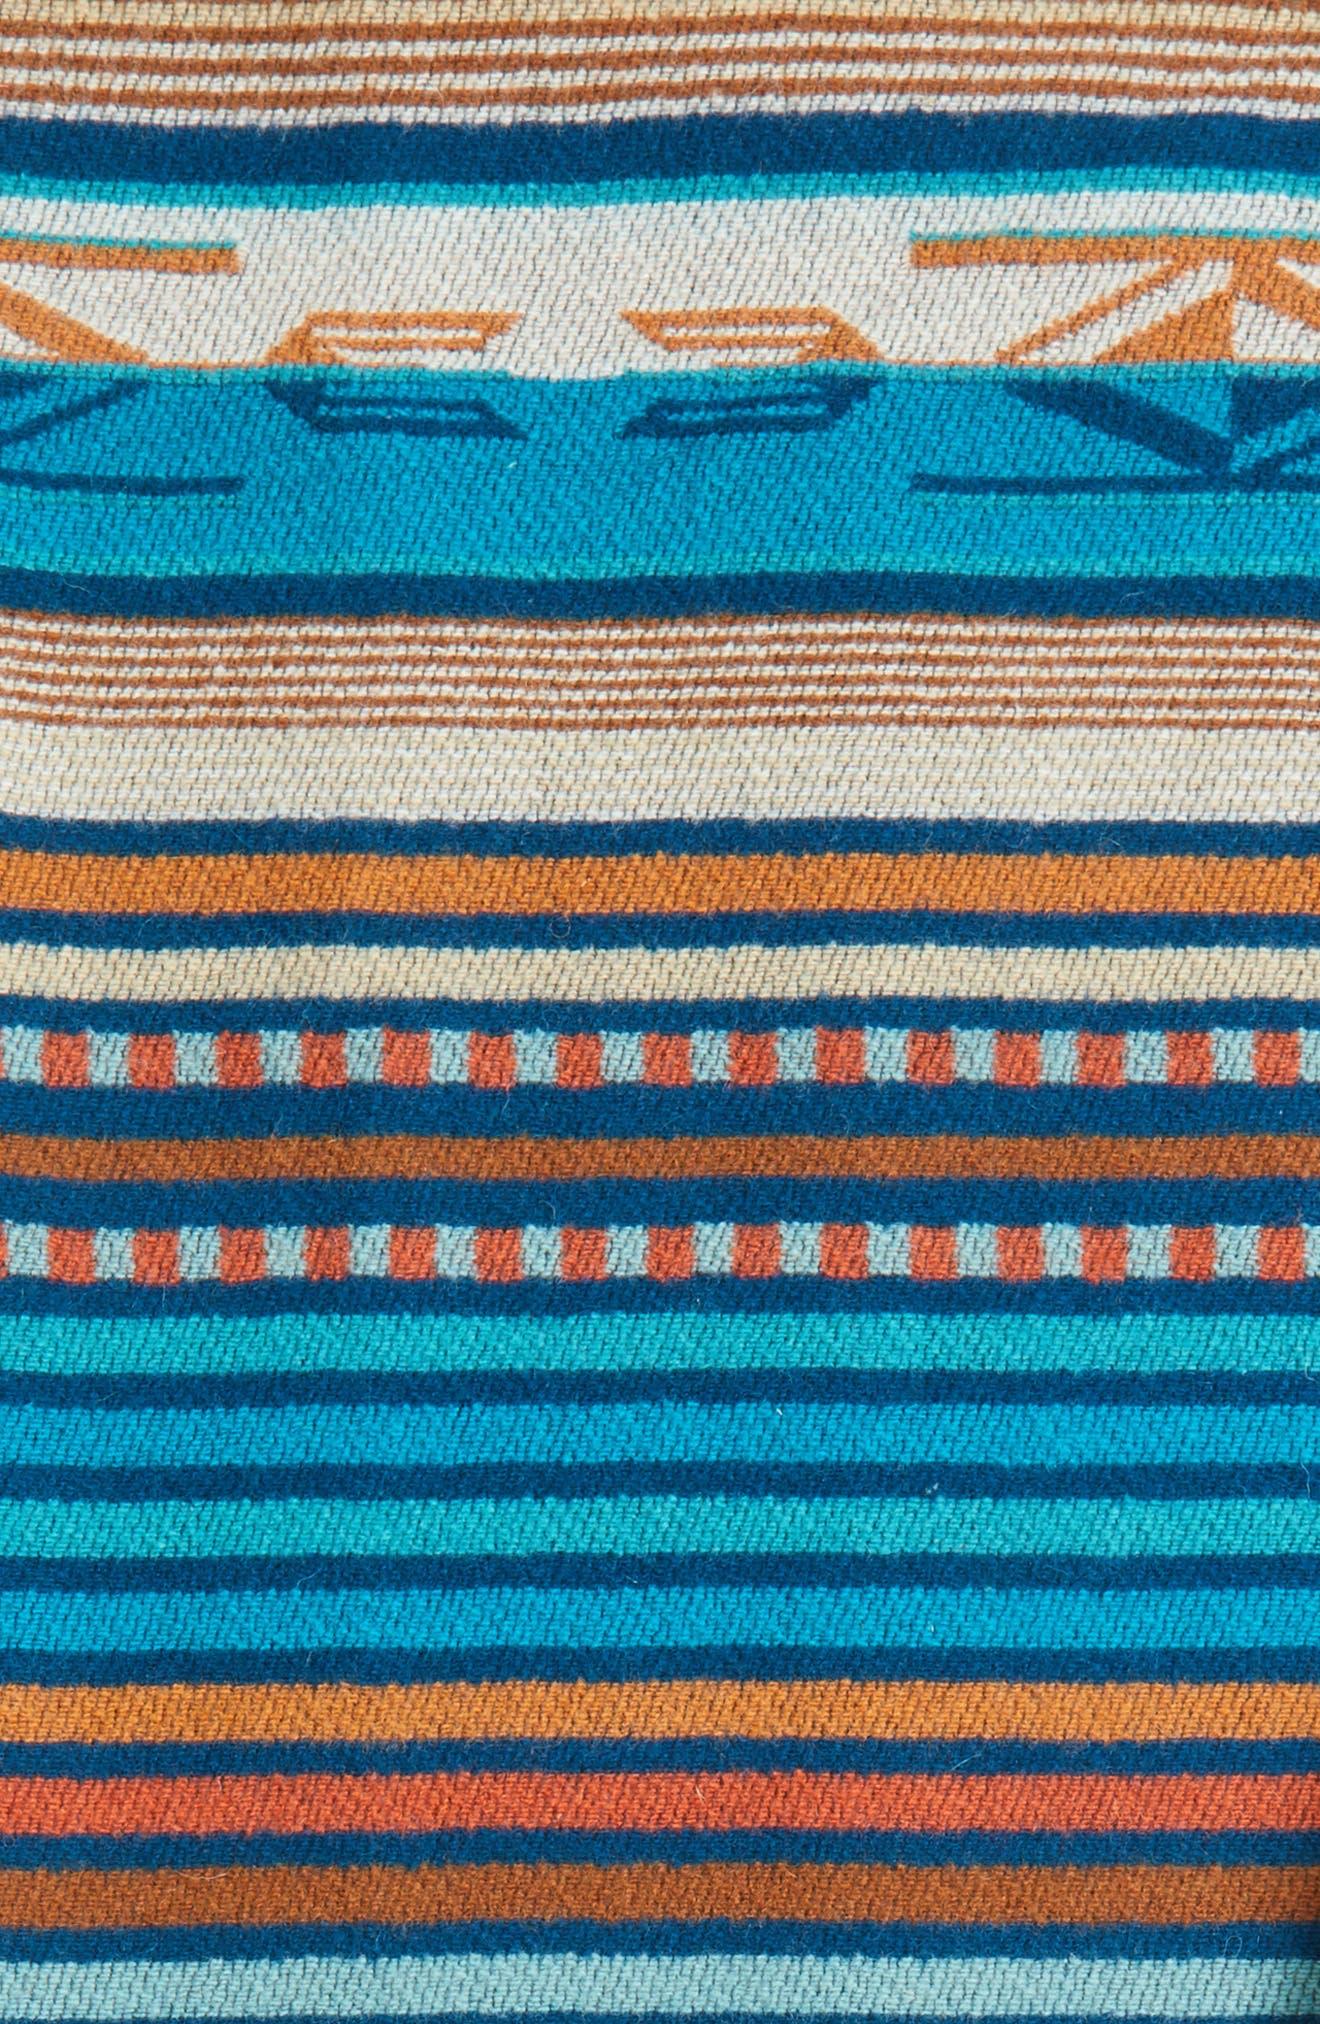 'Chimayo' Fringe Wool Throw,                             Alternate thumbnail 2, color,                             TURQUOISE